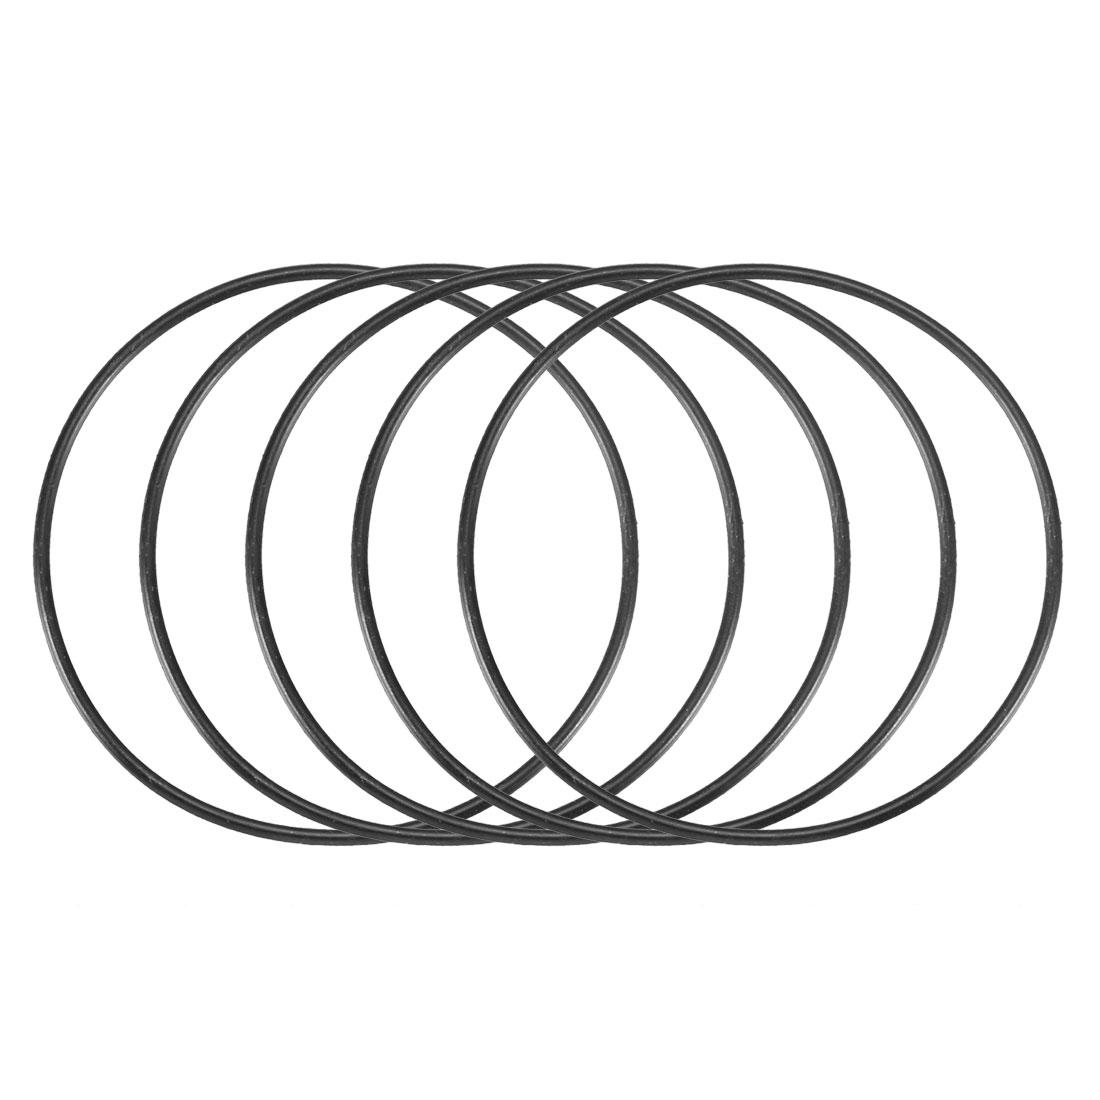 30 Pcs Black 56mm x 1.5mm Nitrile Rubber O Ring NBR Oil Sealing Grommets